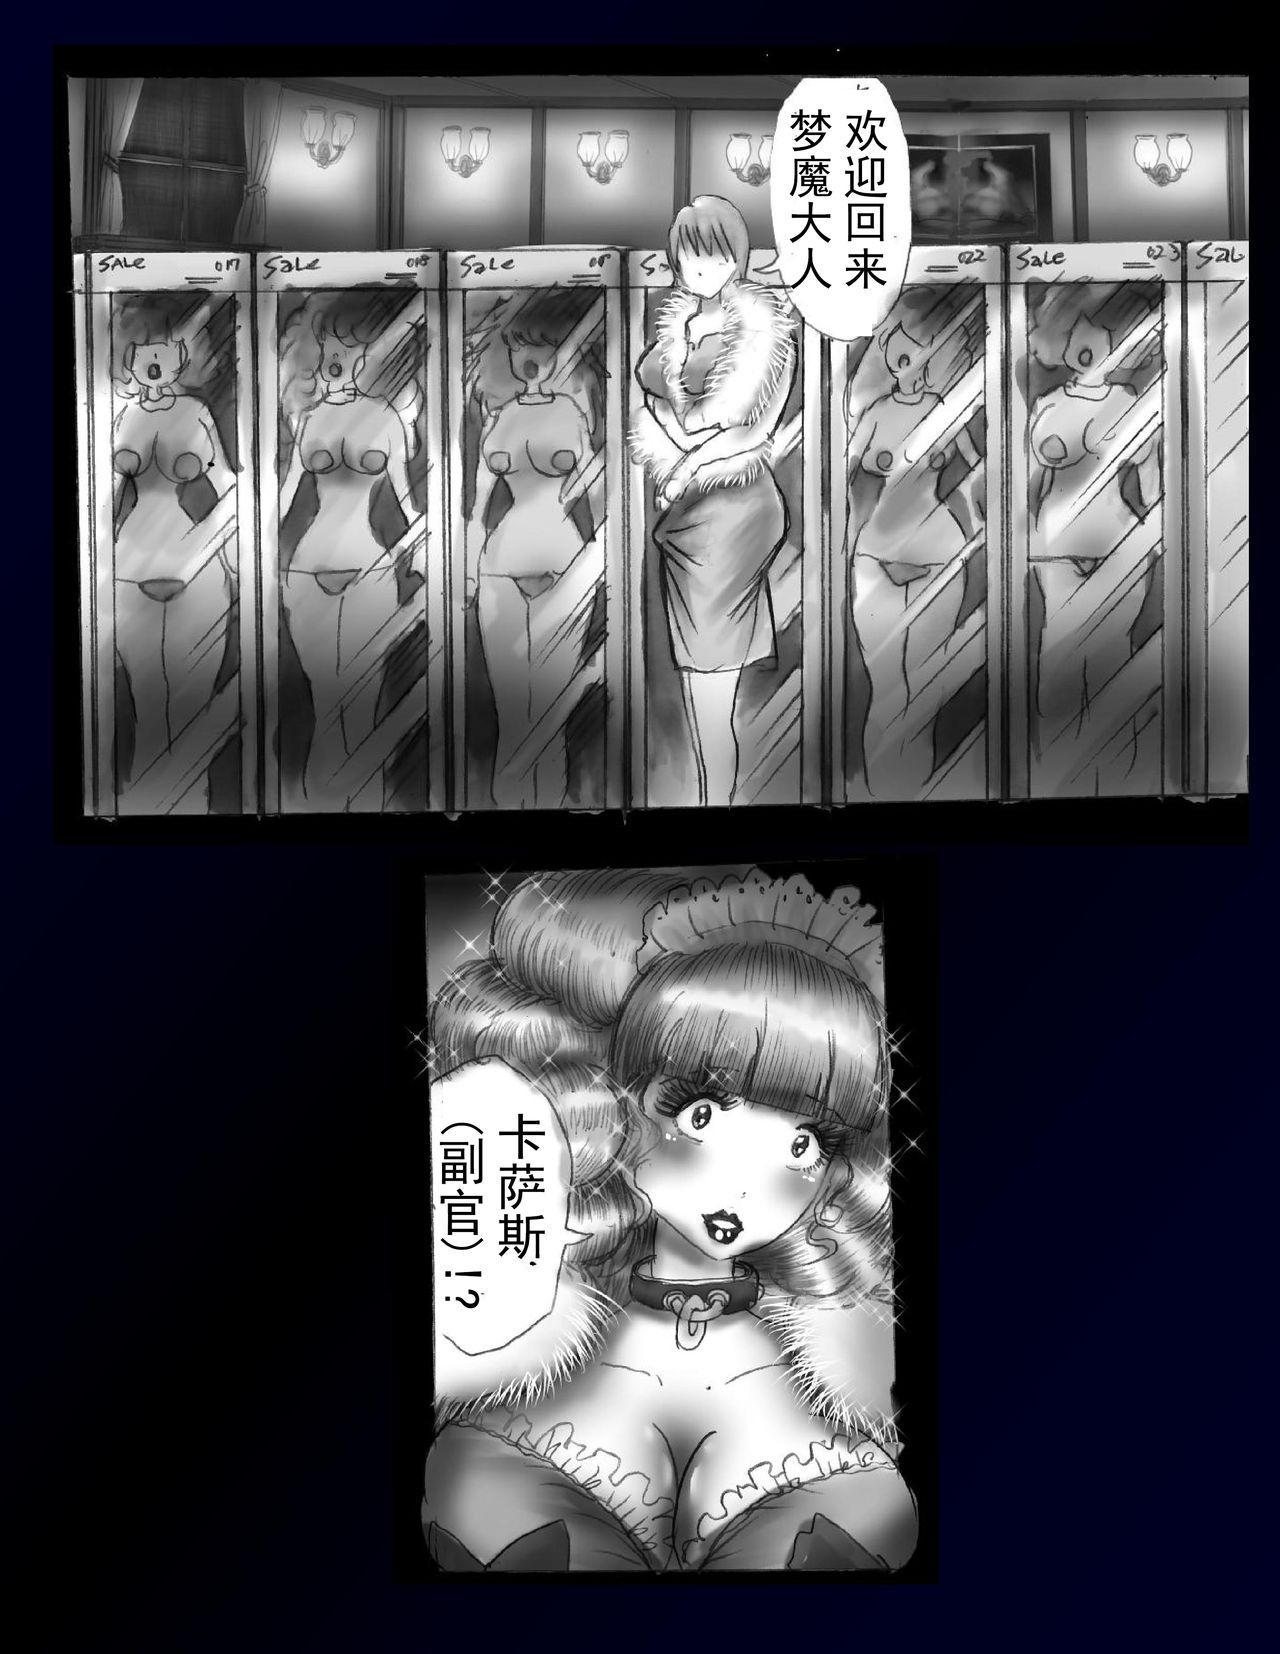 Kyousei Nyotaika Dress 66